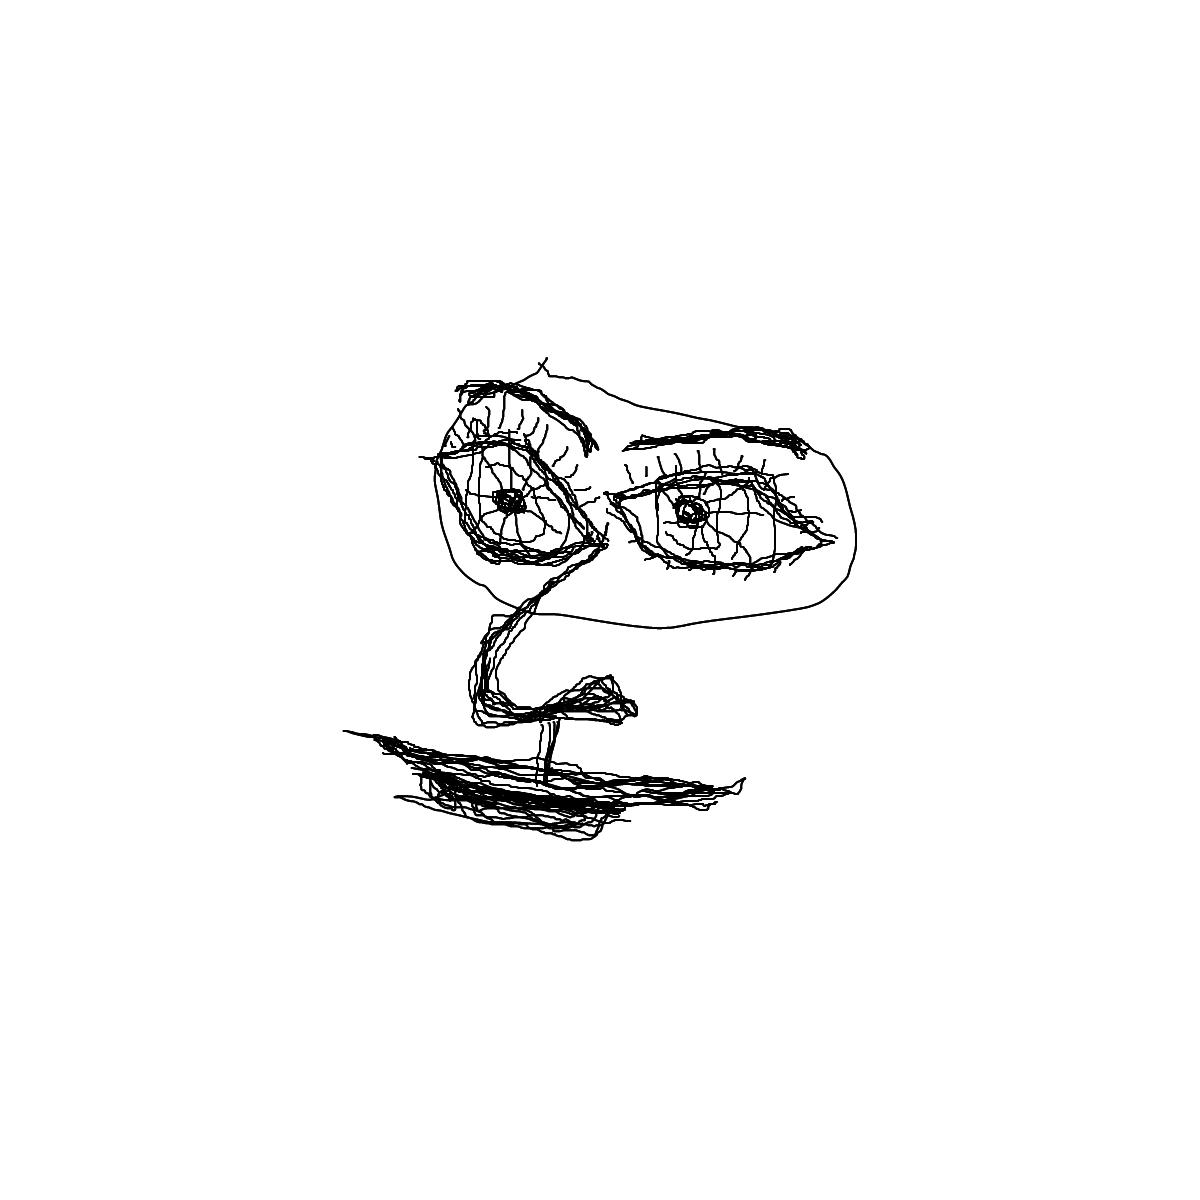 BAAAM drawing#23606 lat:46.5451507568359400lng: 6.6498923301696780